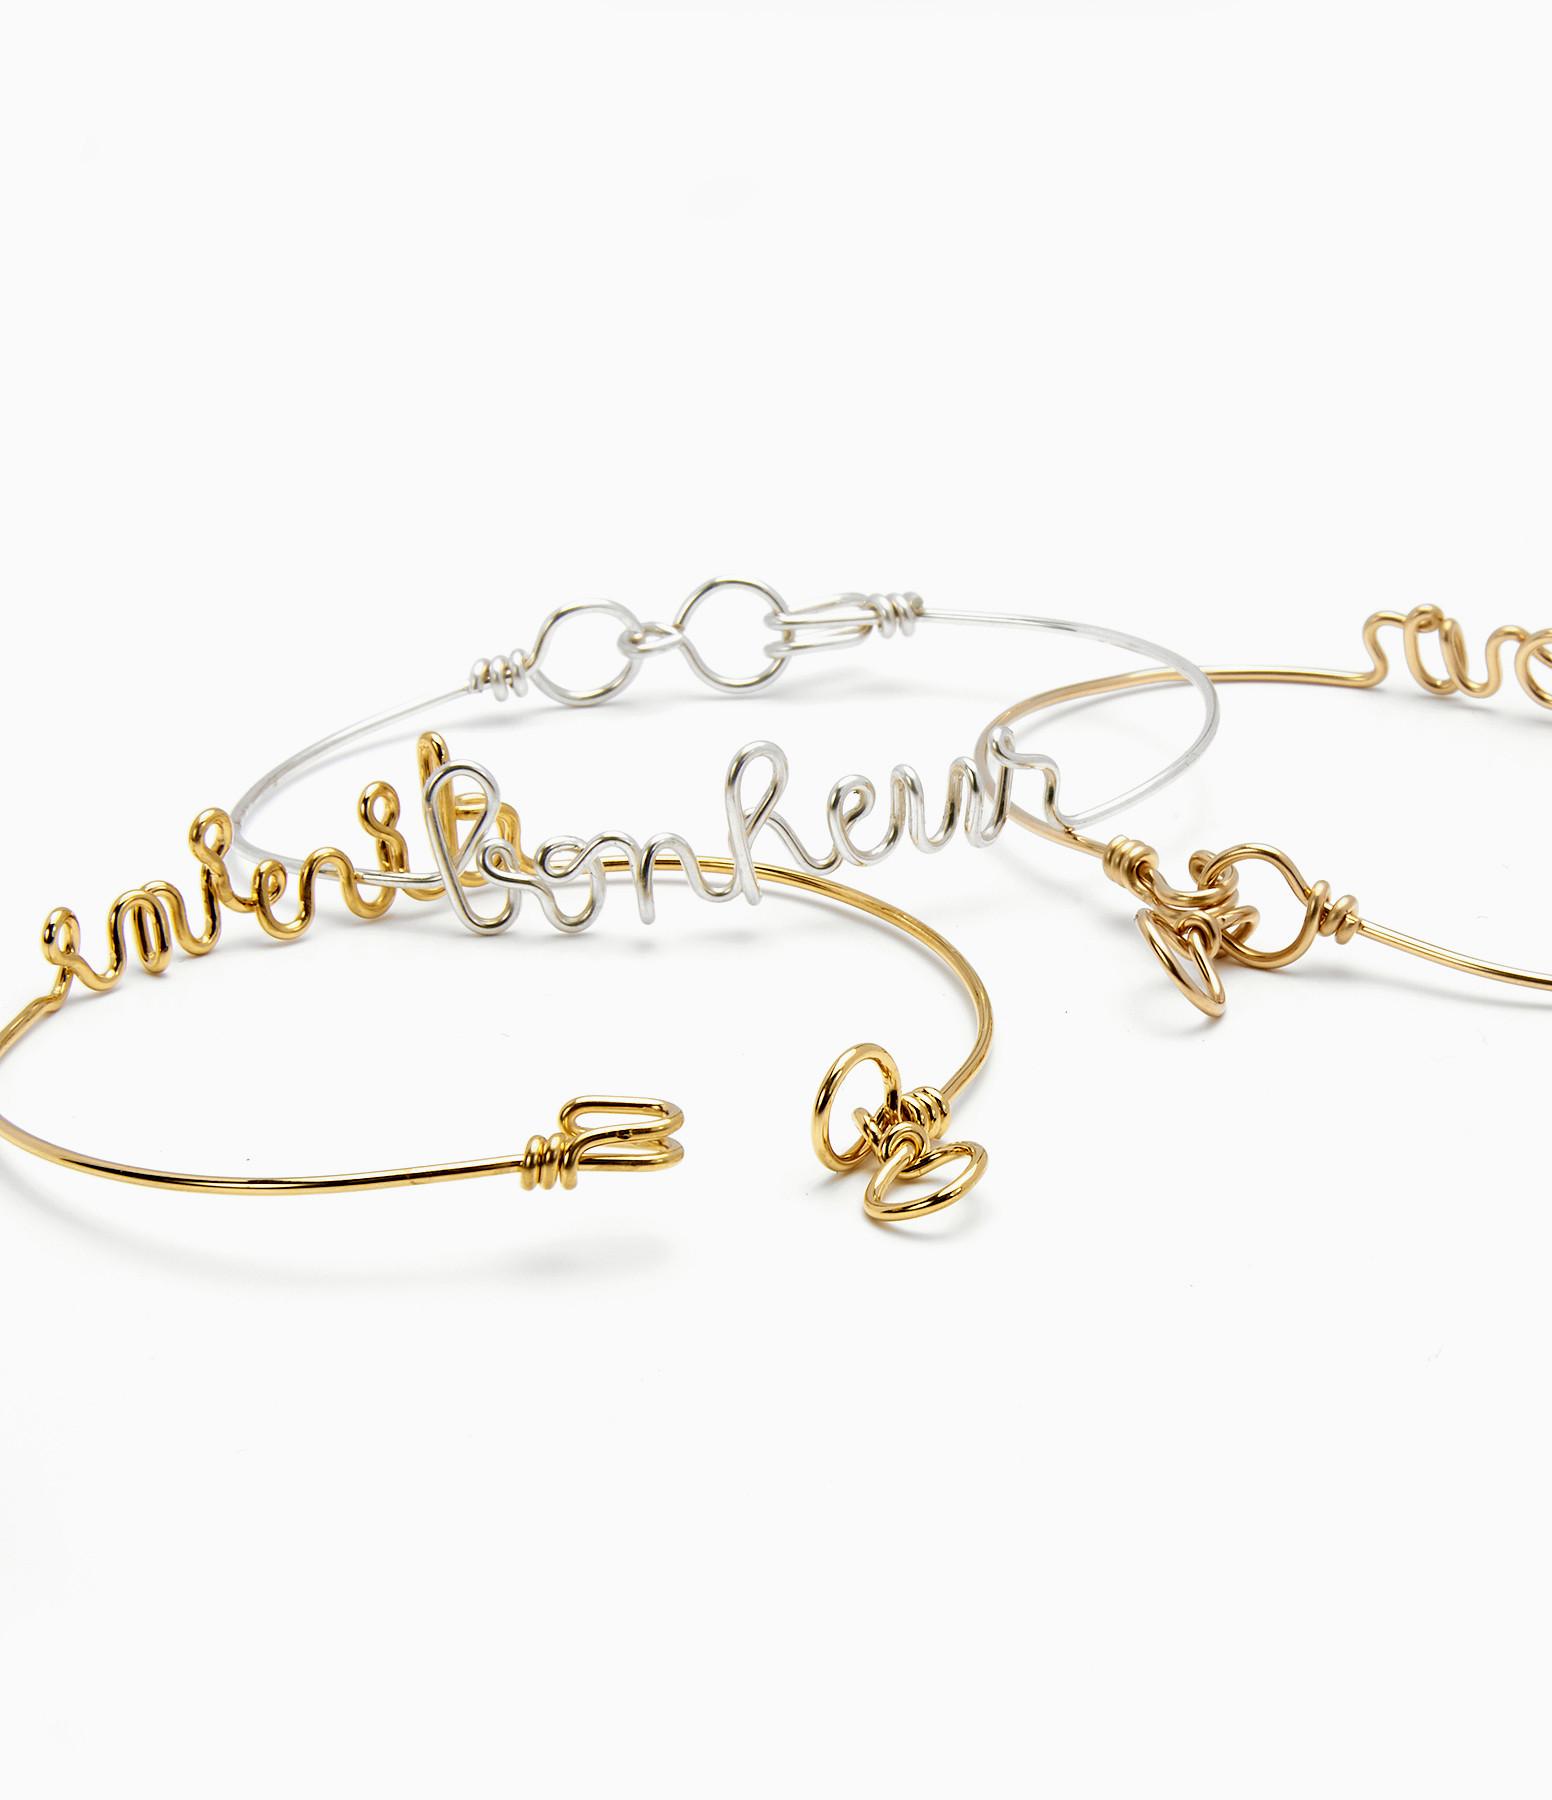 Bracelet Fil Exclu Lulli Jolie Argent - ATELIER PAULIN